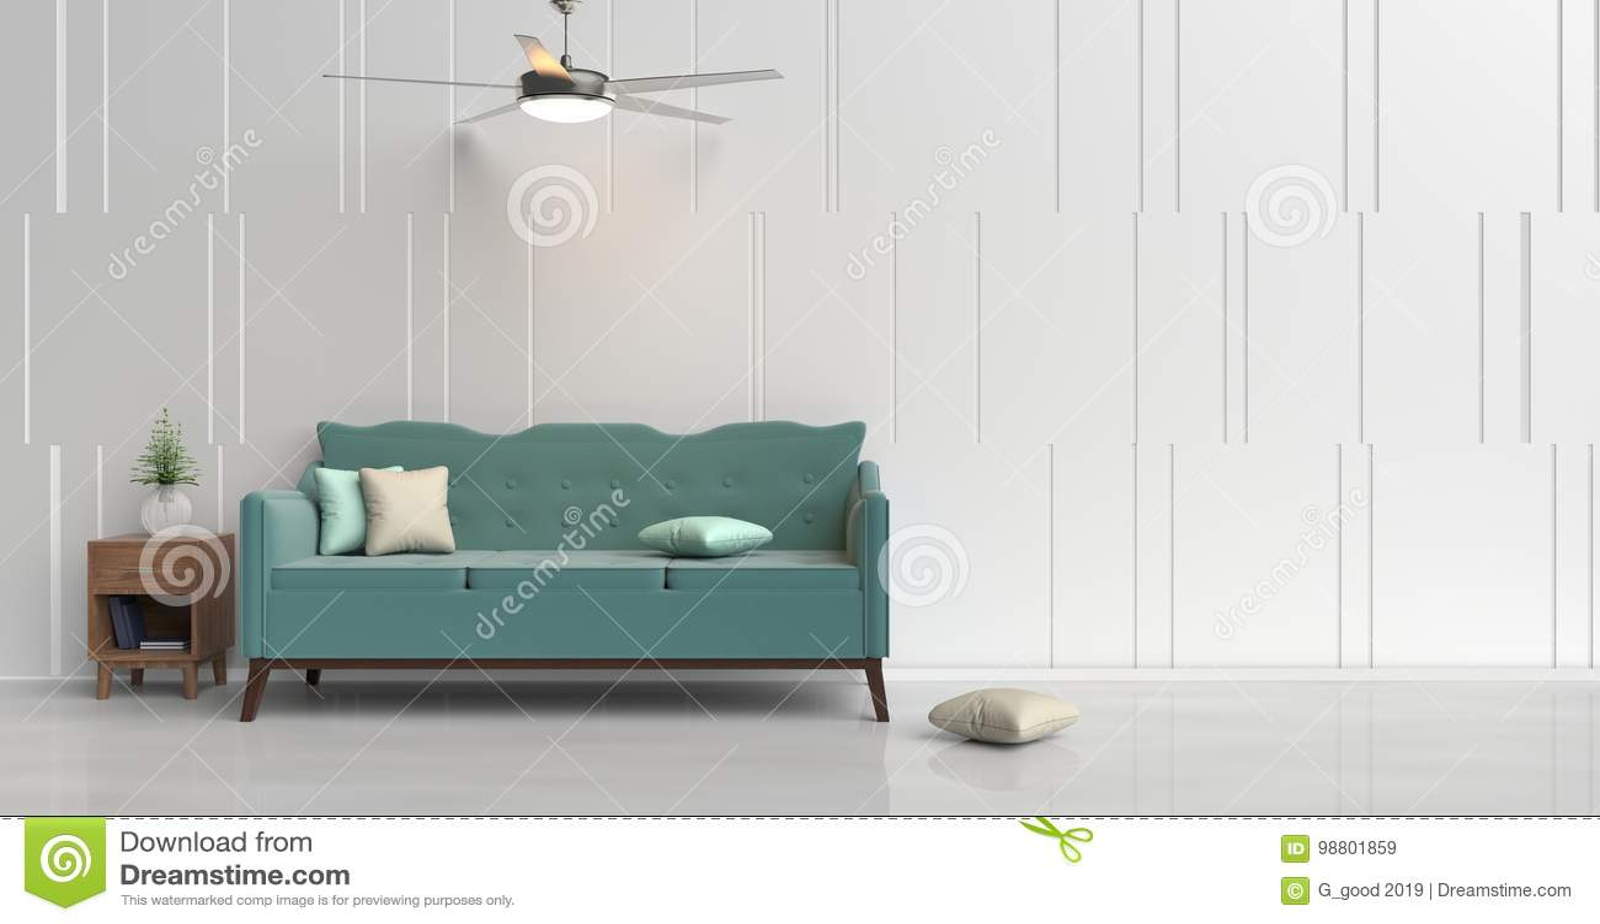 Pastel color living room. stock illustration. Illustration of cement ...